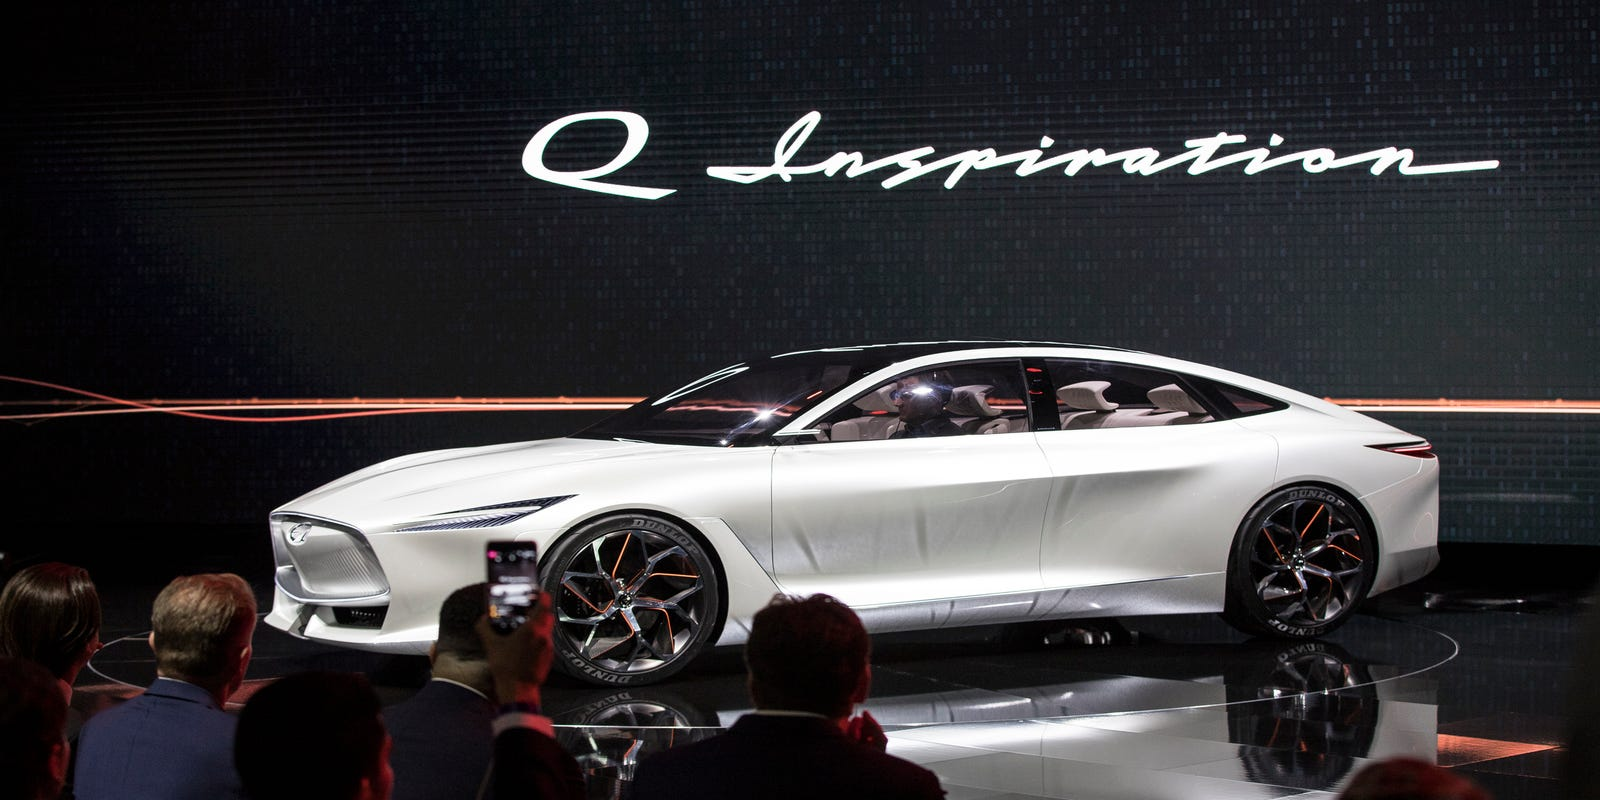 Infiniti Q Inspiration Concept Meant To Inspire Future Car Lineup - Infiniti car show